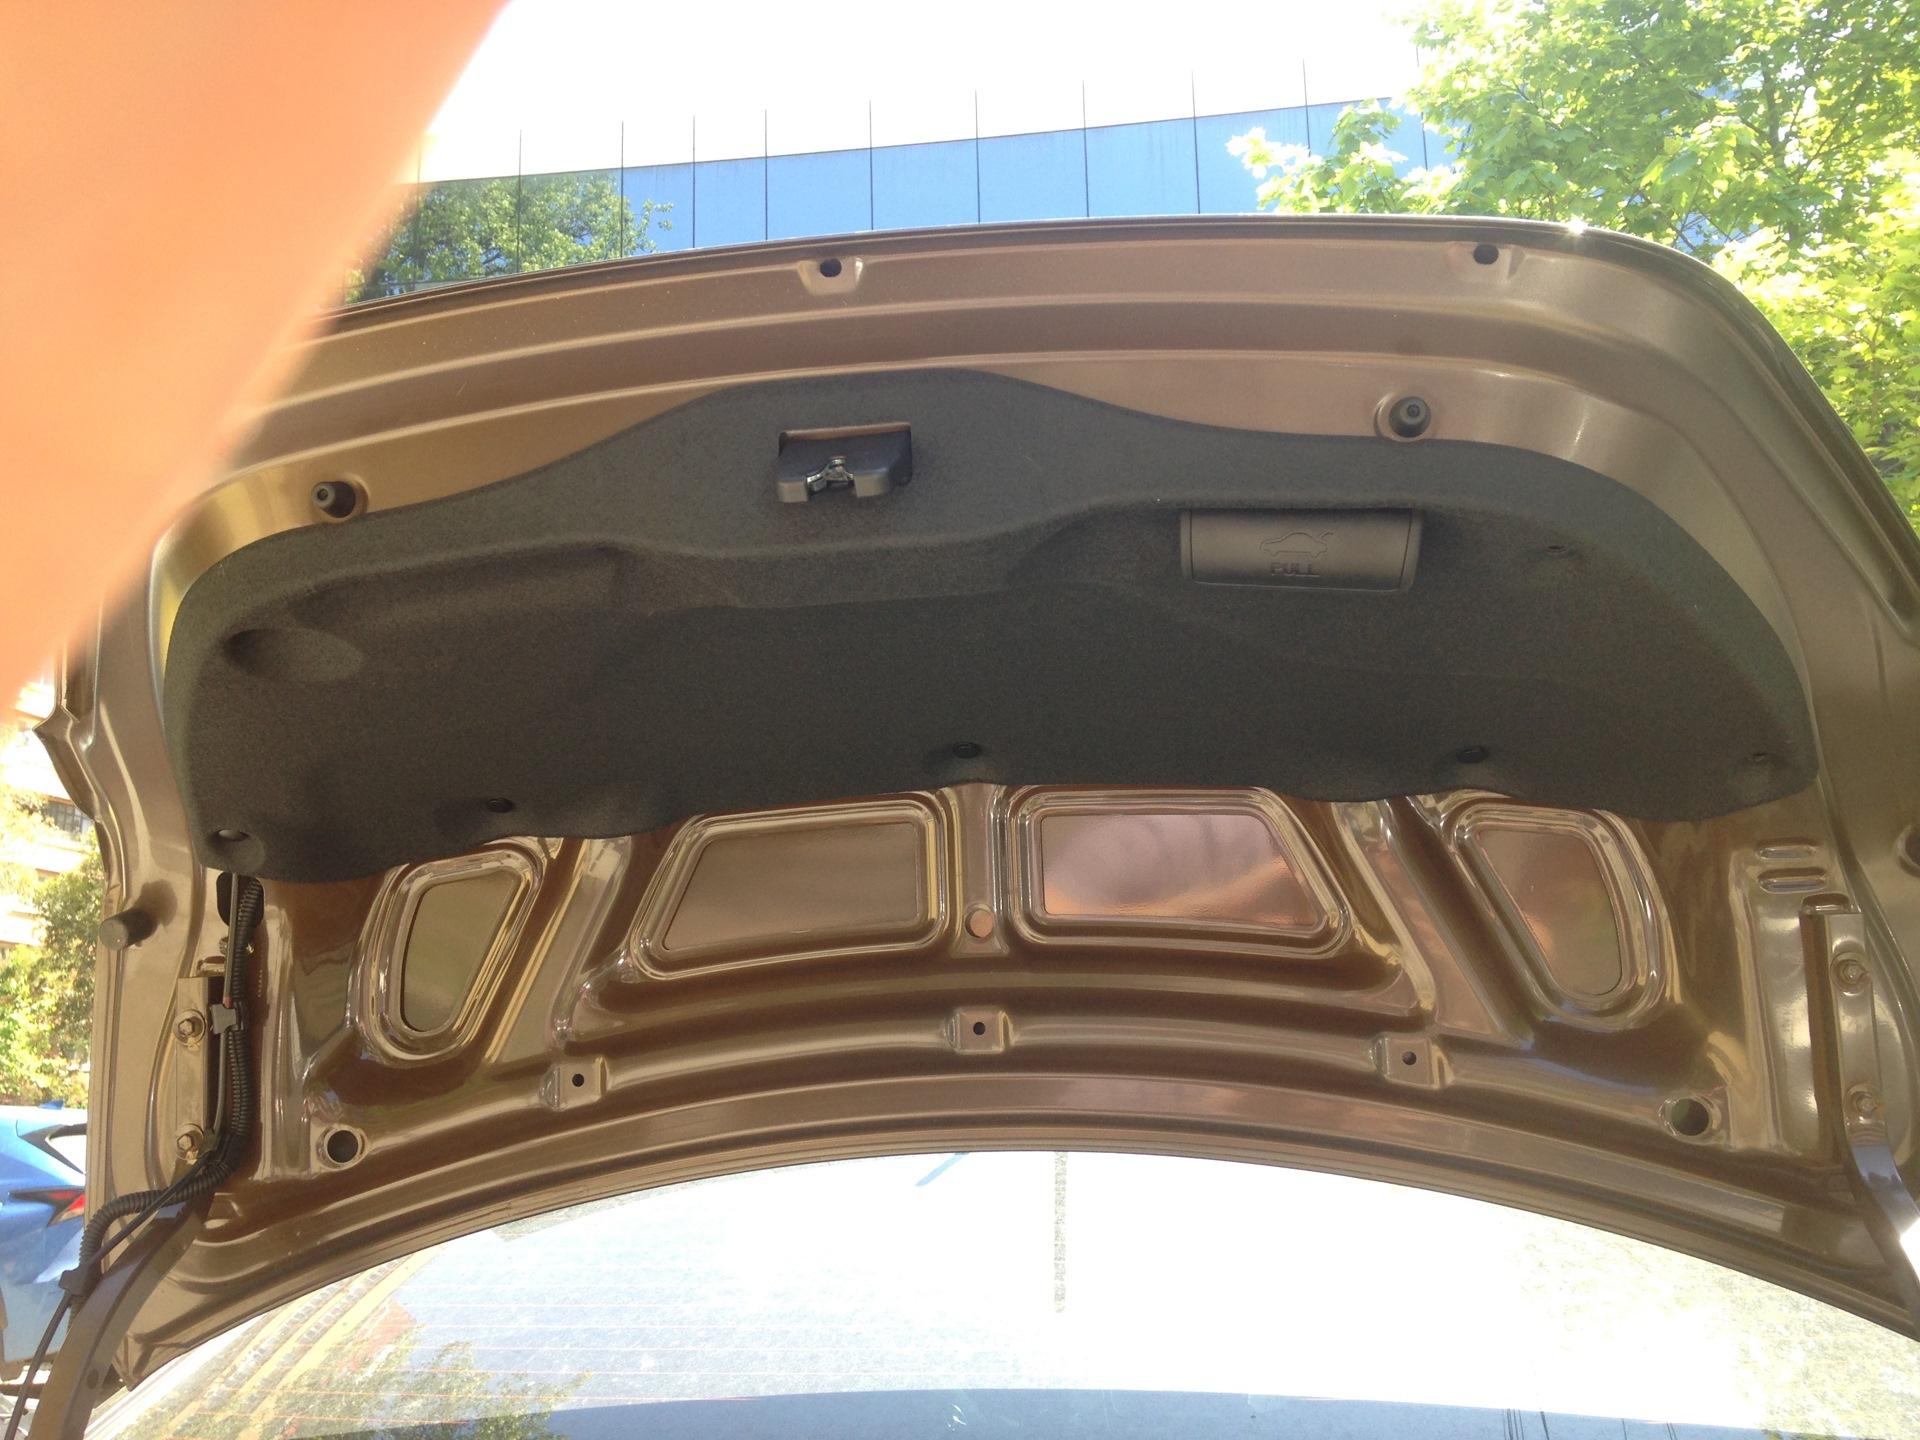 Багажник на солярис своими руками